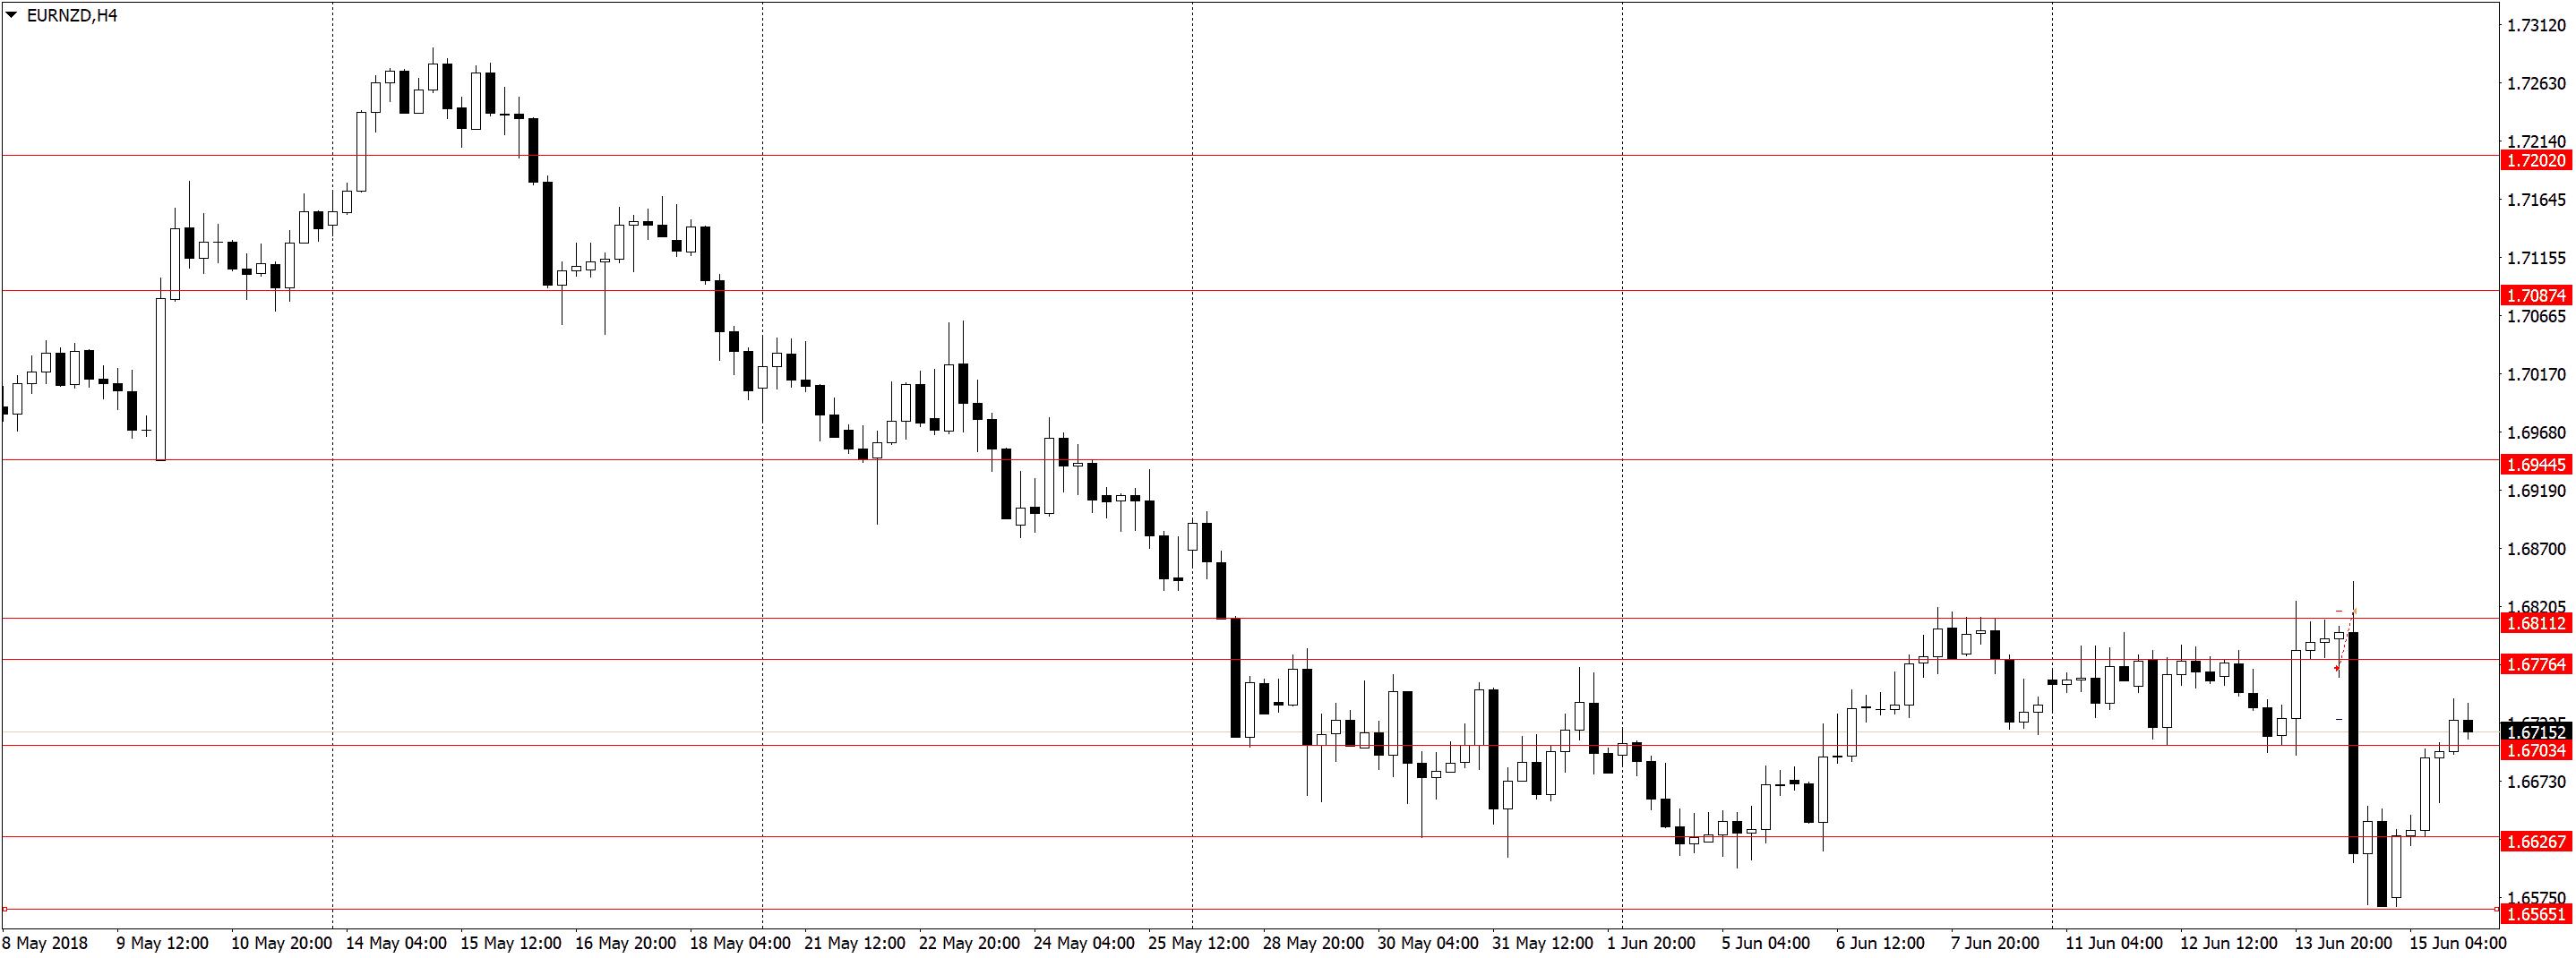 EURNZDH4 Усталость от трейдинга, торговля акций, переторговка